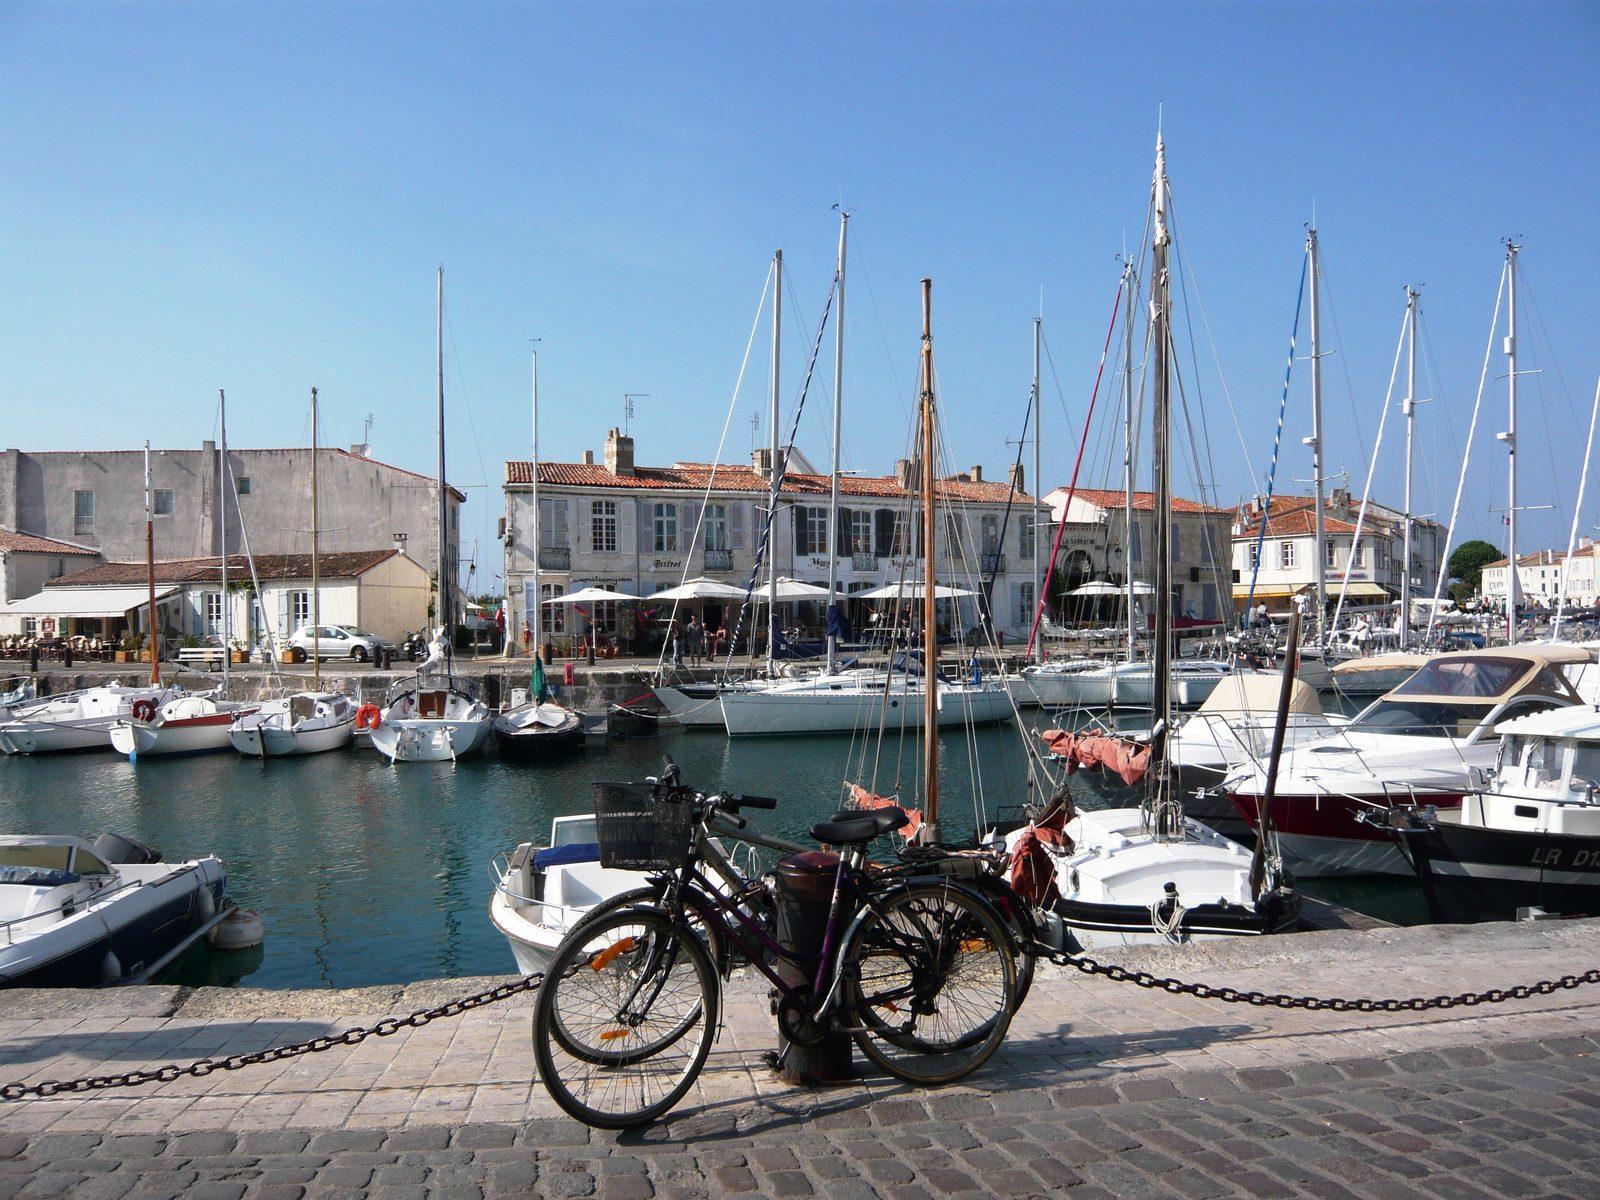 Vakantie, Frankrijk, Charente Maritime, vakantiehuizen, Ile d'Oleron